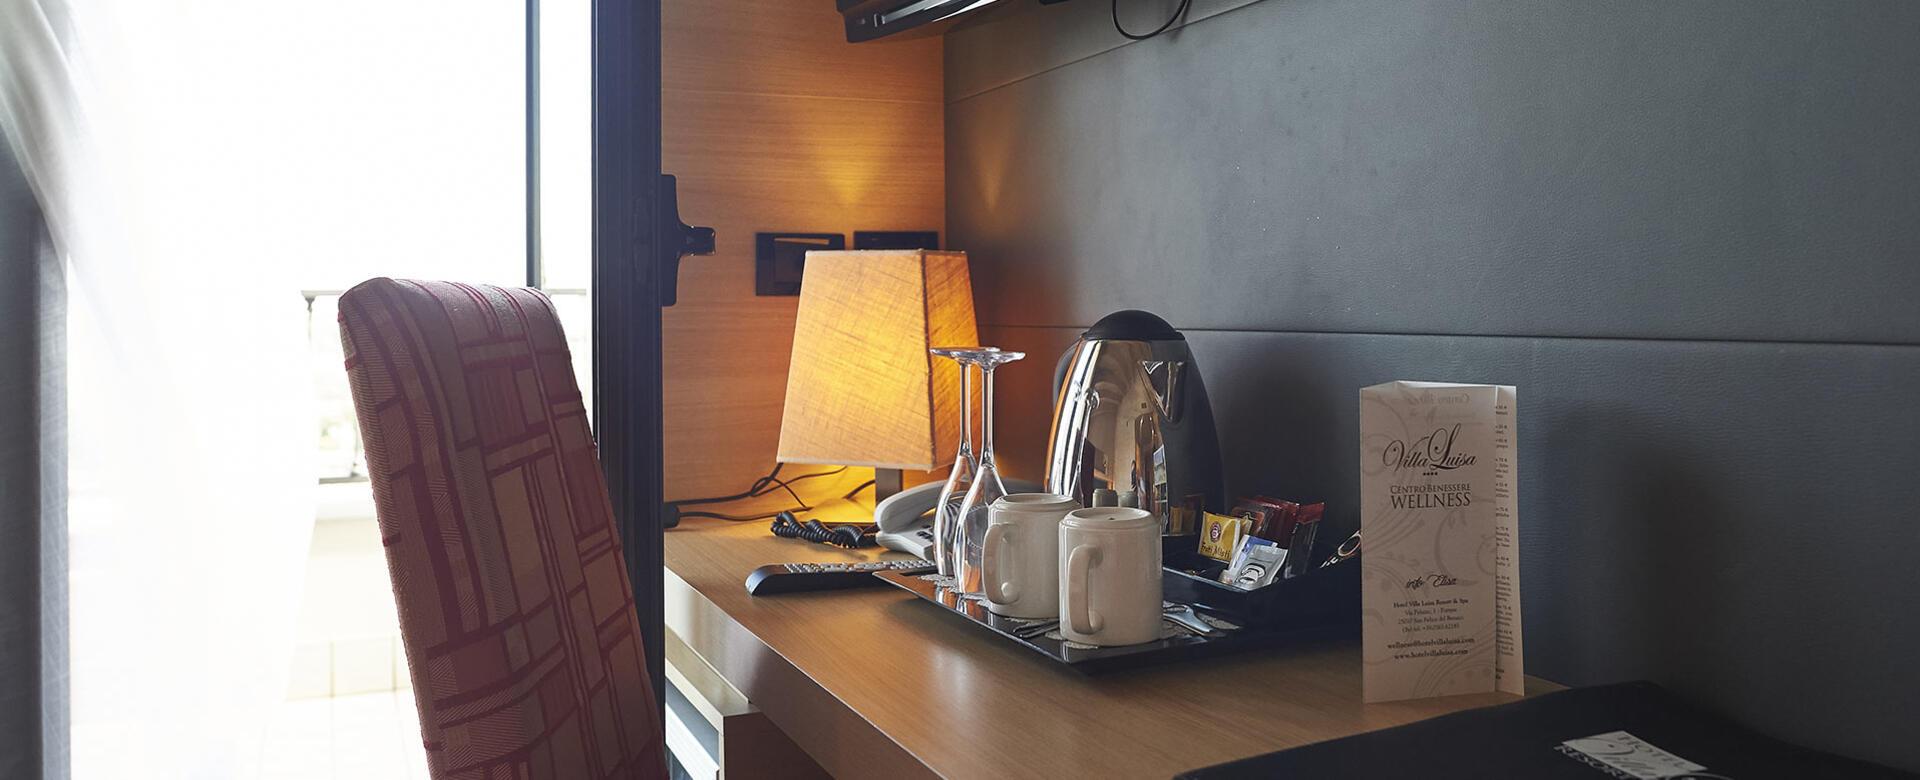 hotelvillaluisa it camere 003